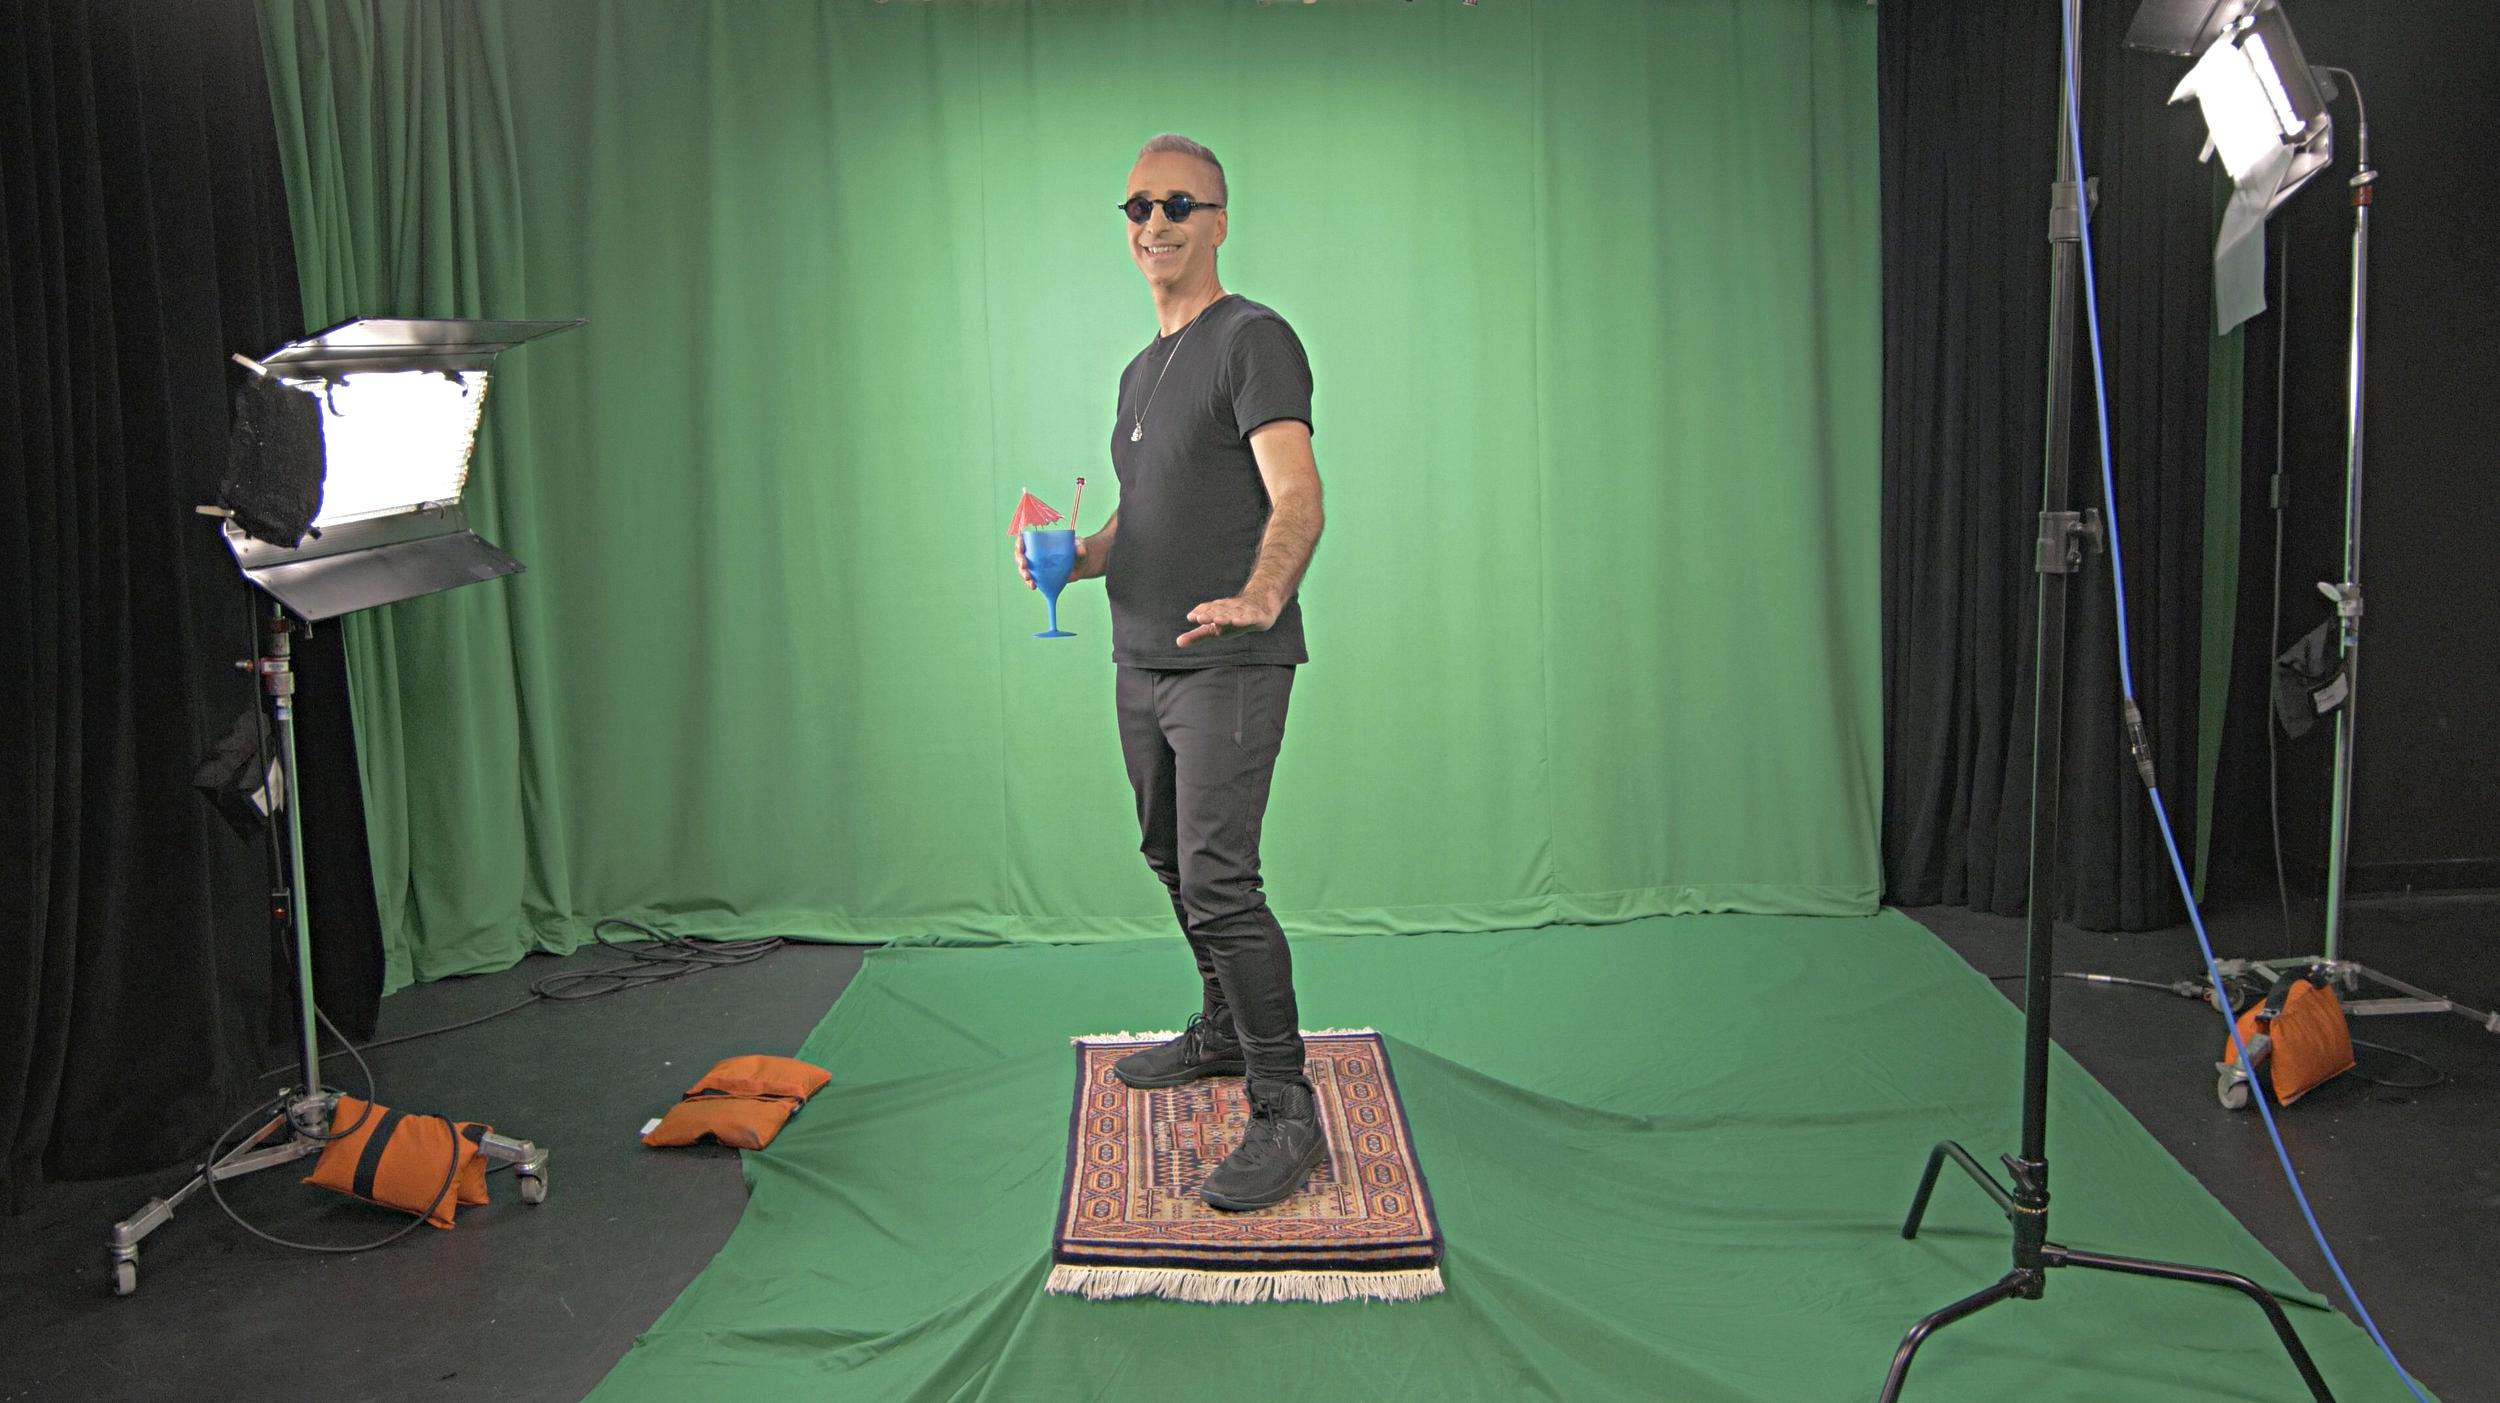 Mindful Dan - MT shoot (surfing Dan & drink).jpg